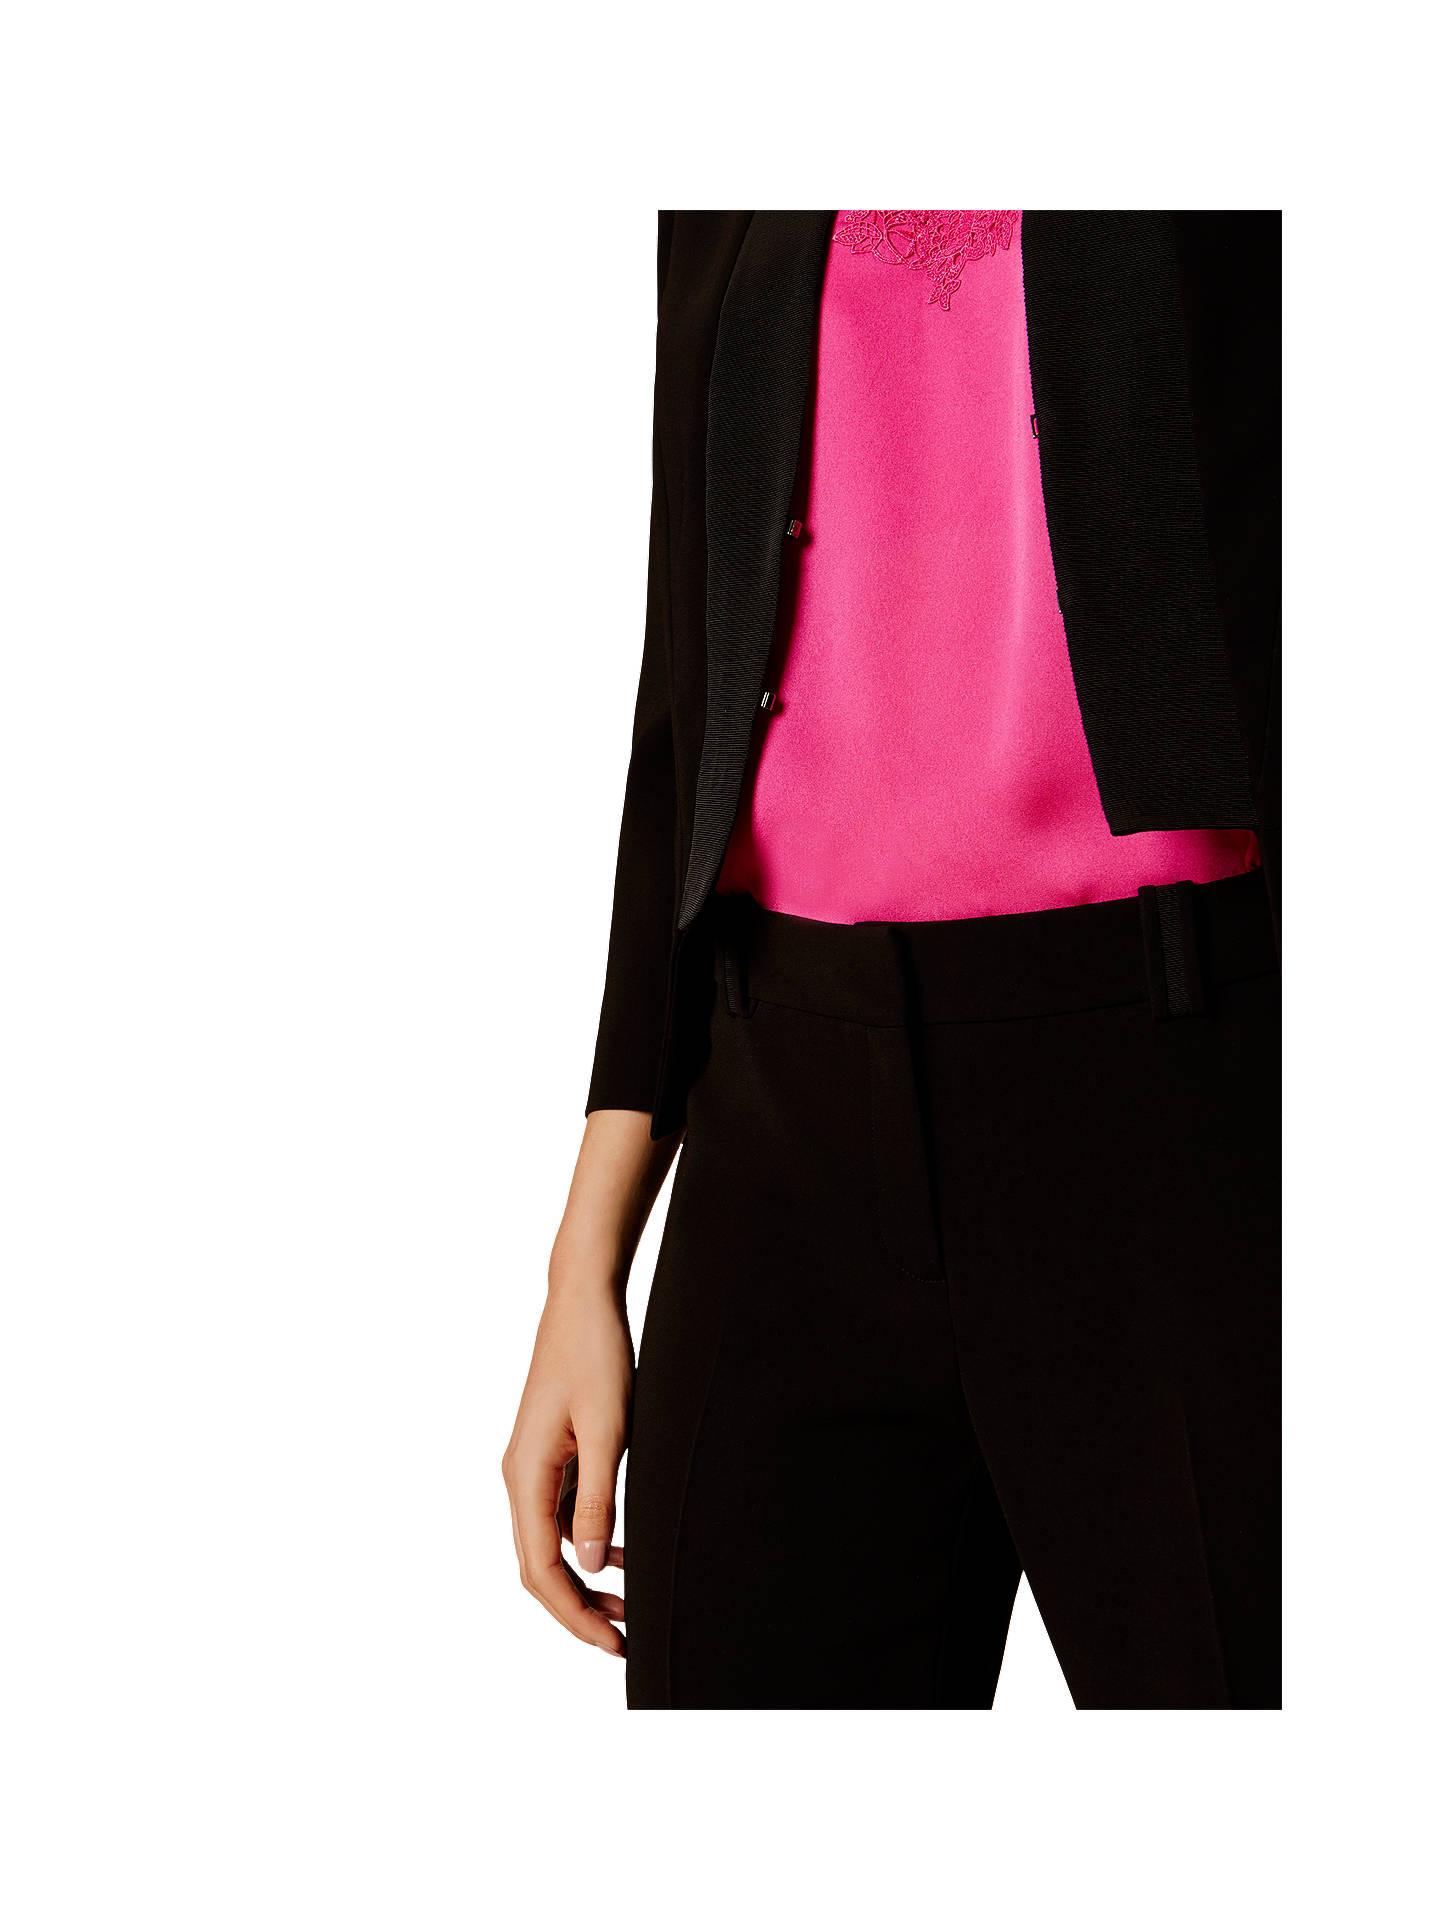 Karen Millen Open Front Tailored Jacket, Black at John Lewis